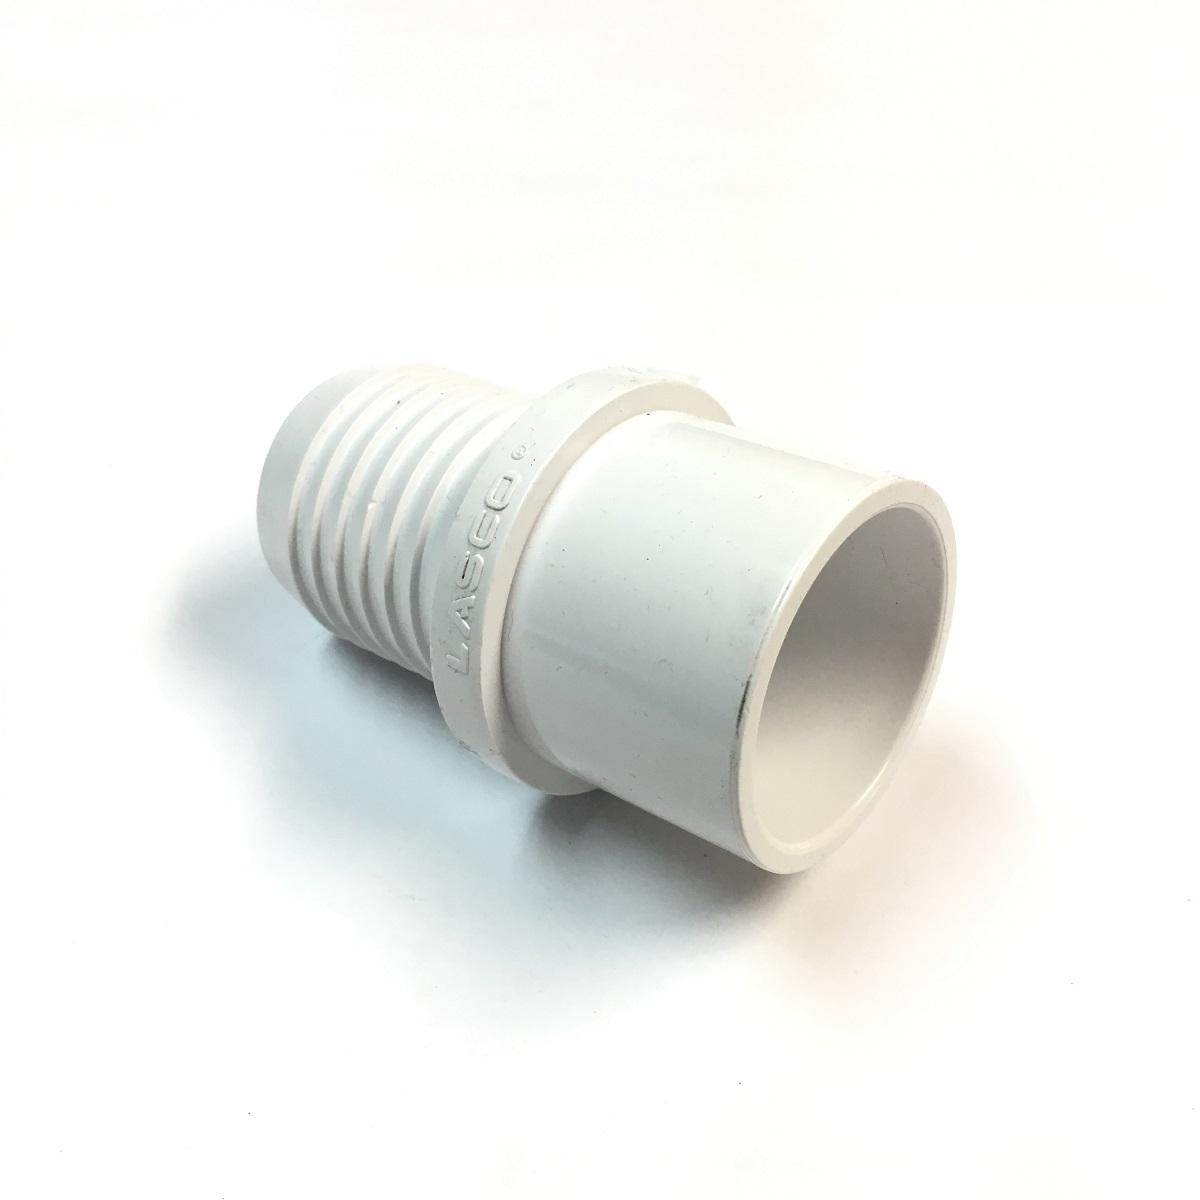 Adapteur 1 5 8 39 39 Coll Coch Concept Piscine Design